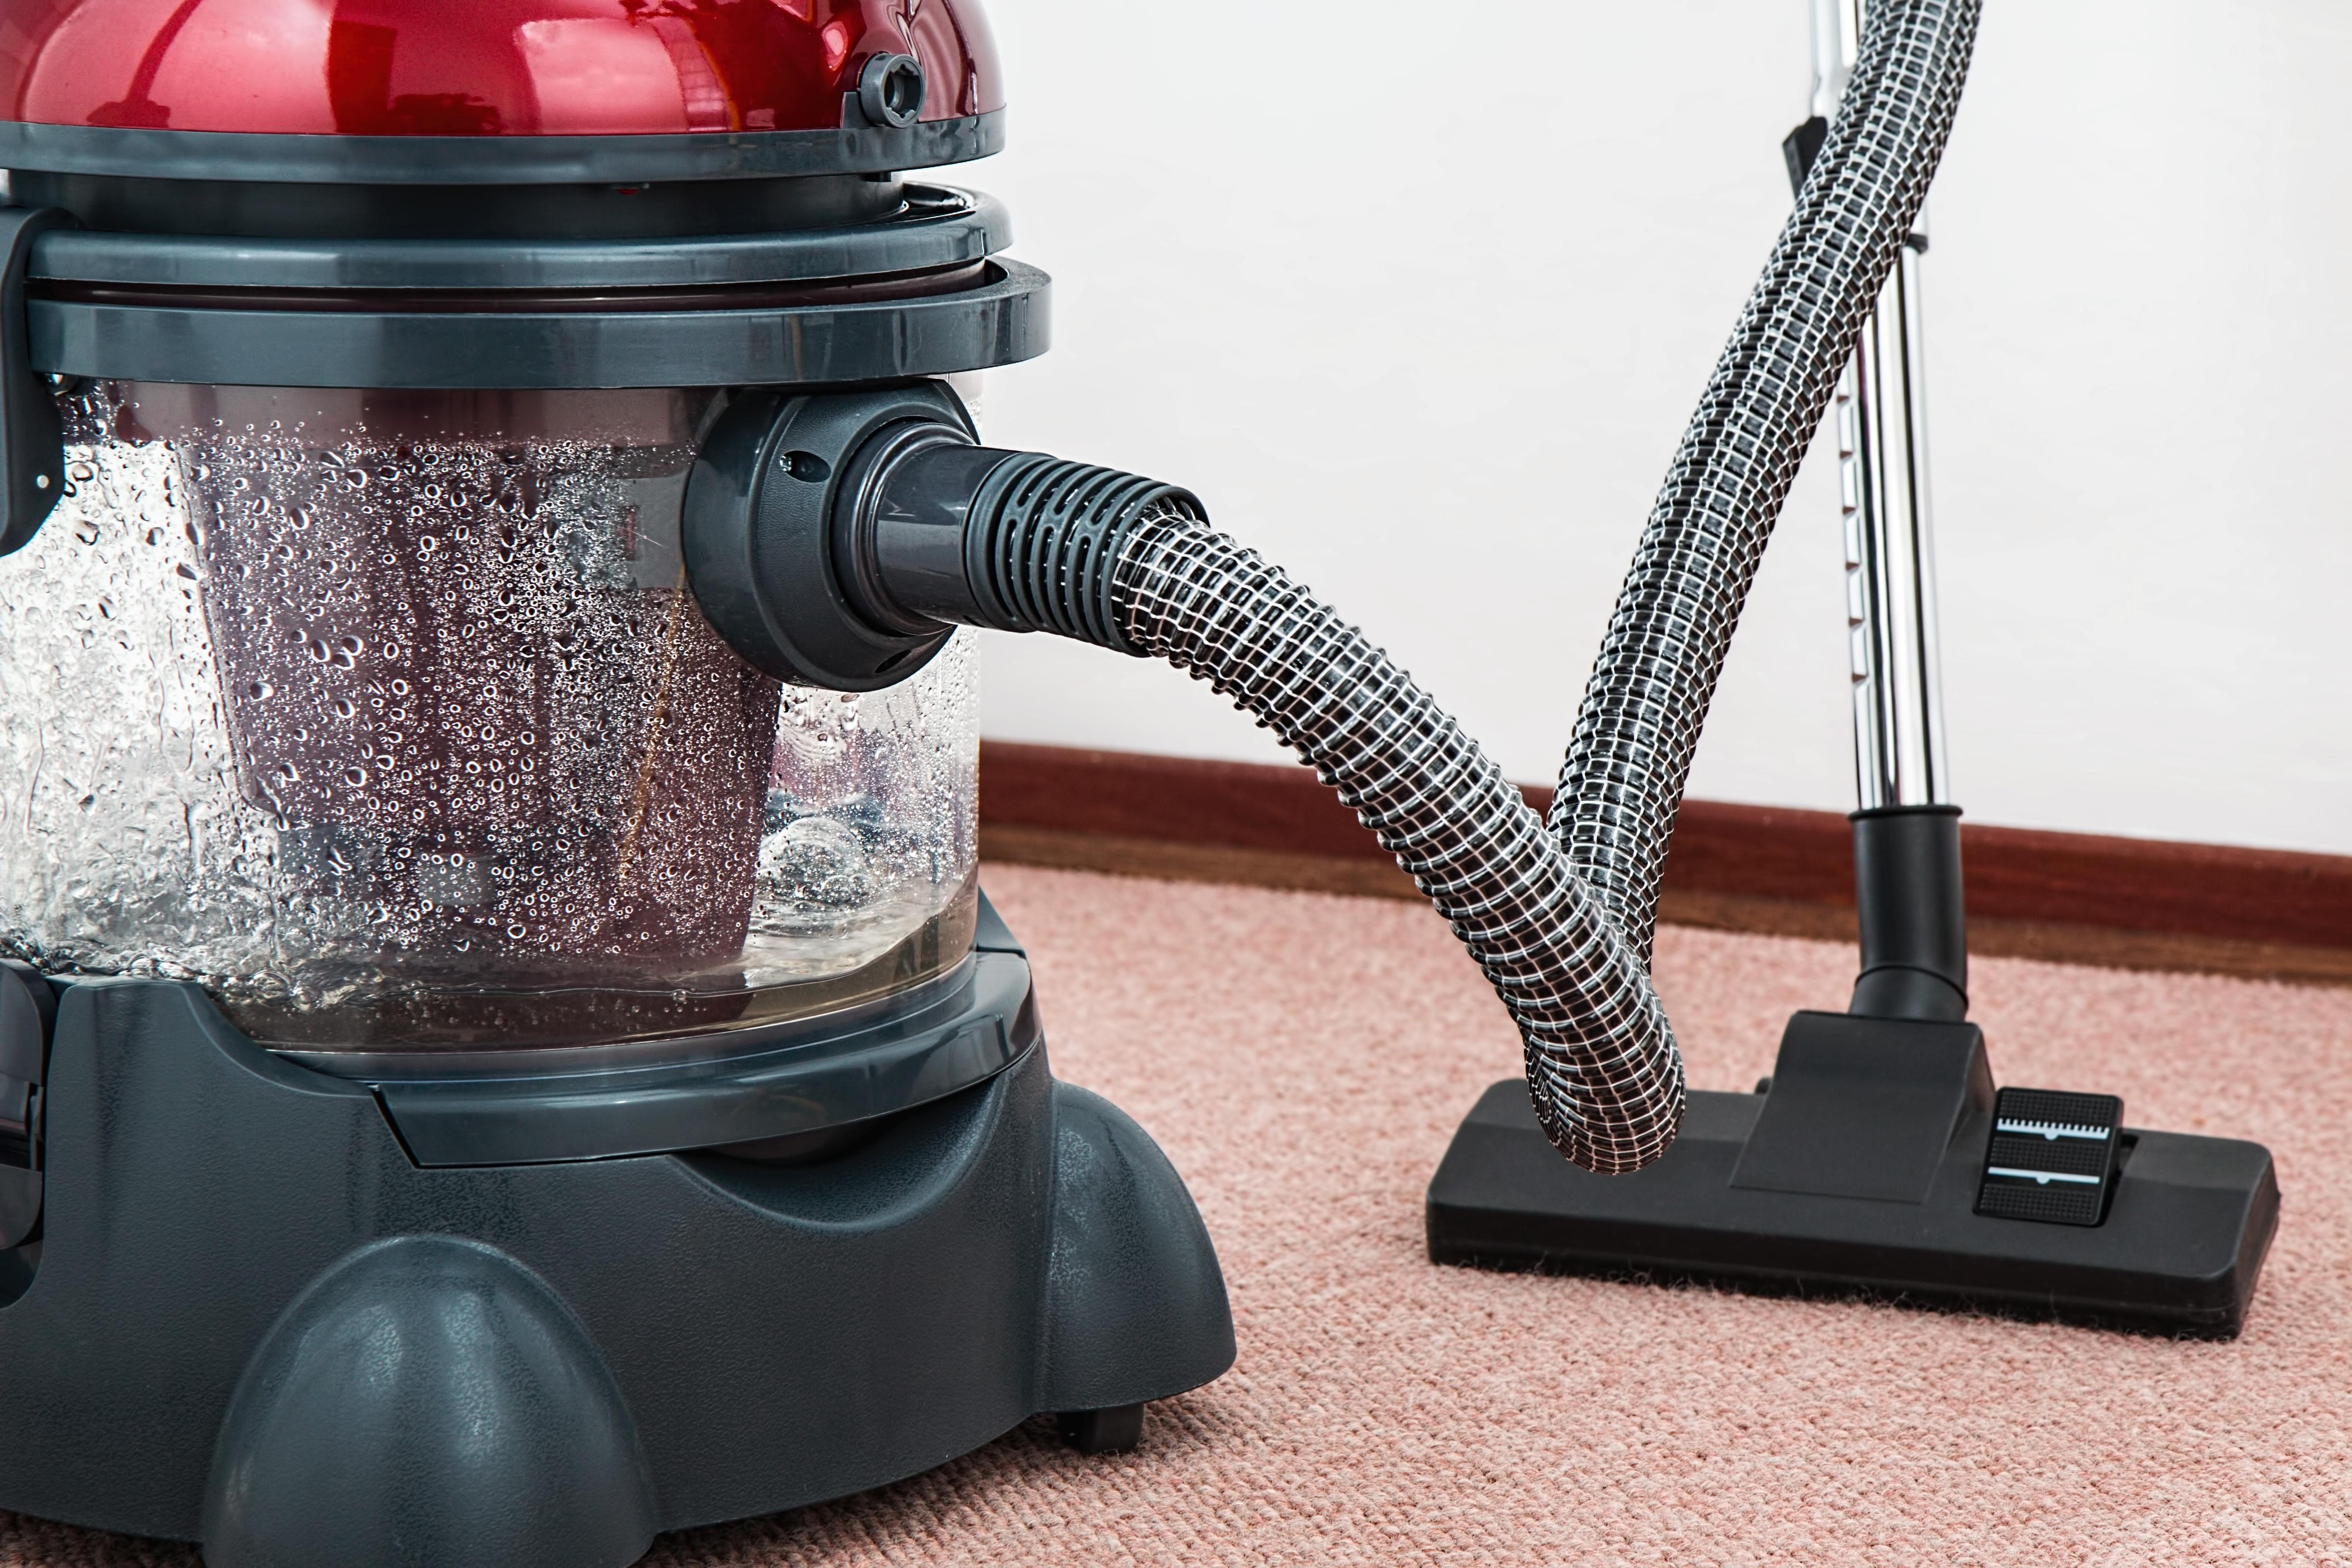 appliance-carpet-chores-38325